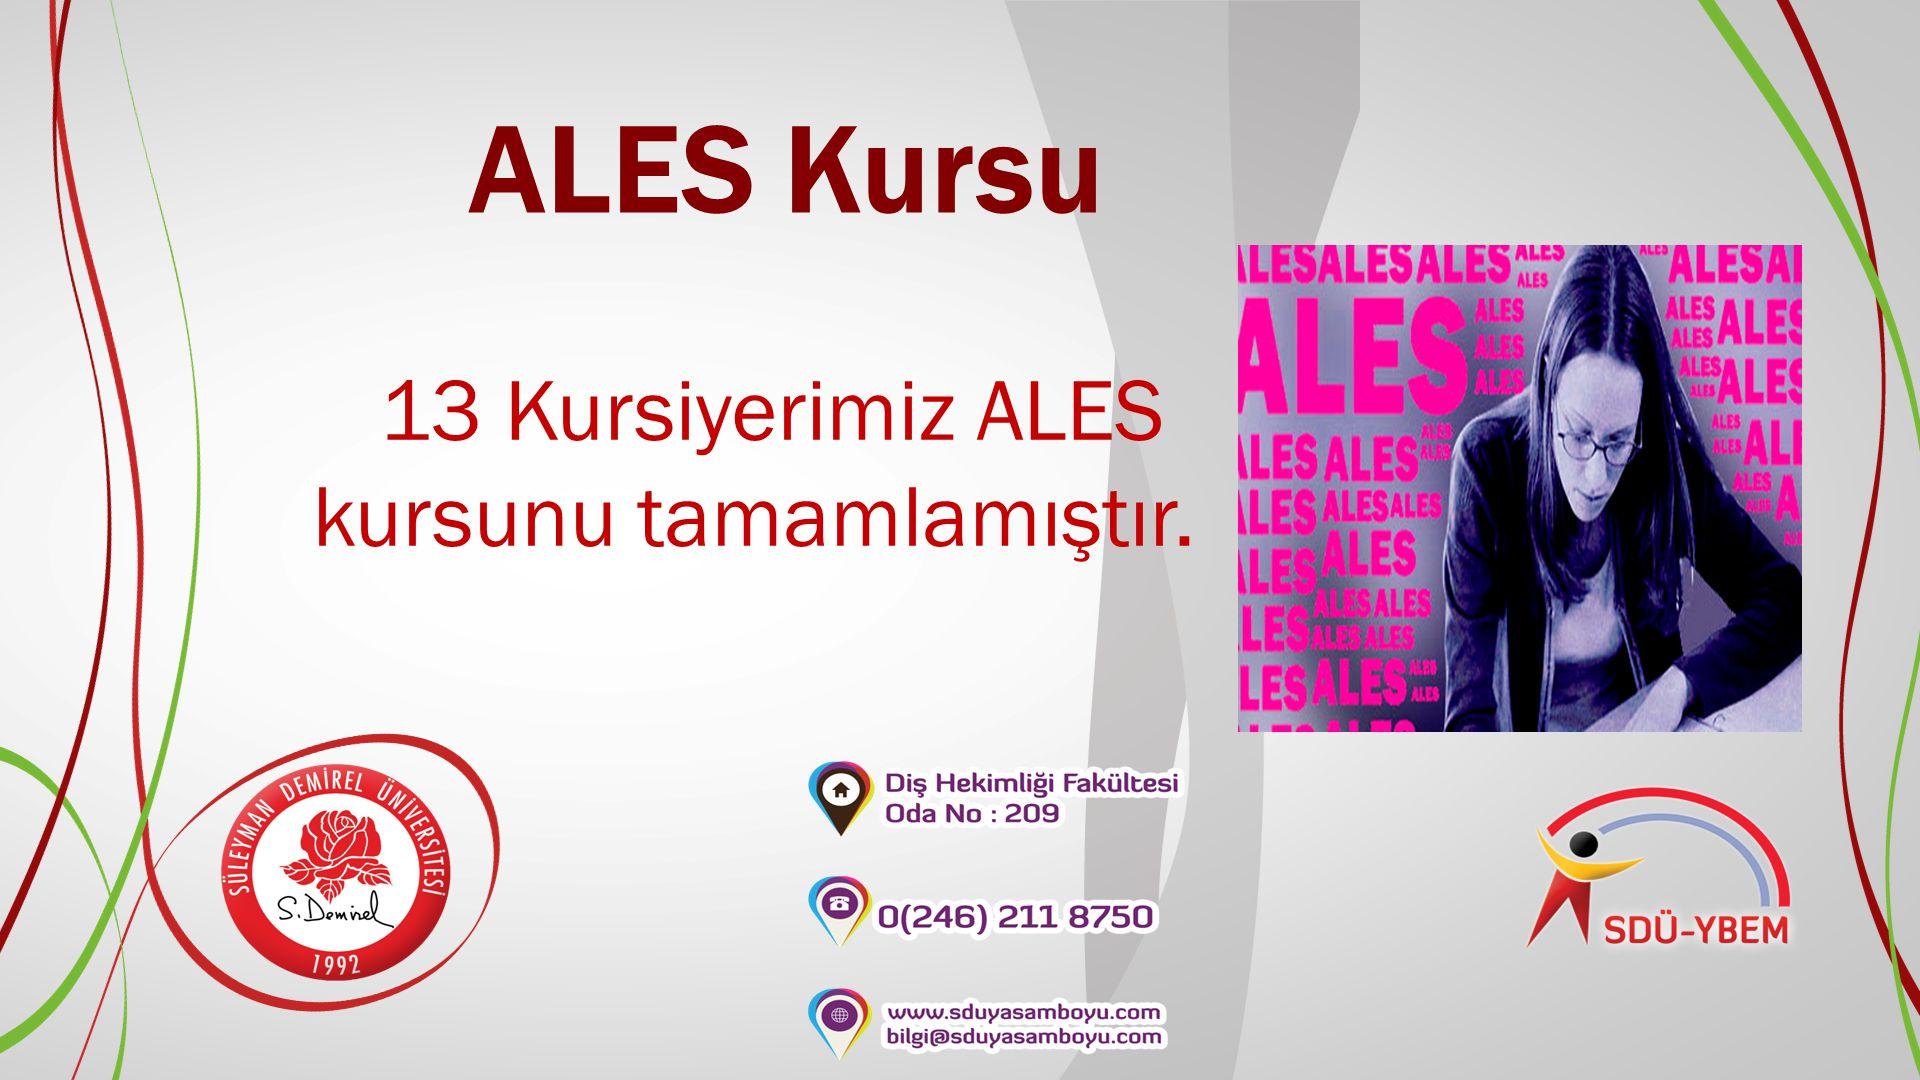 ALES Kursu 13 Kursiyerimiz ALES kursunu tamamlamıştır.